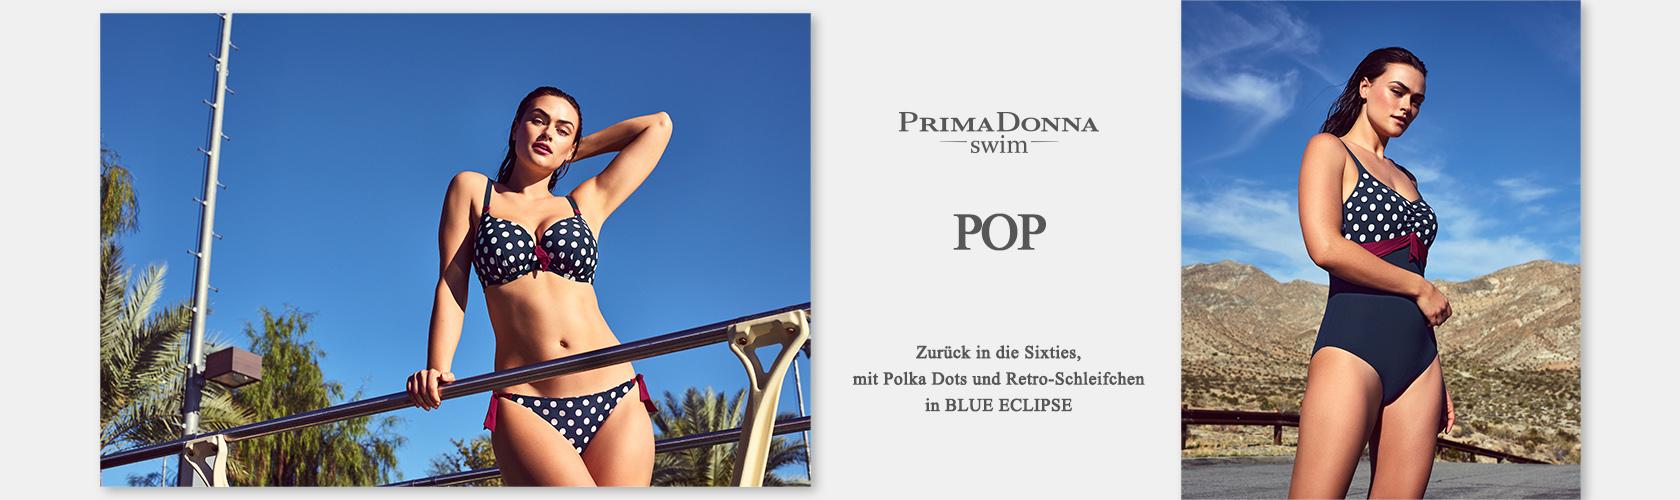 Slideshow POP BEC 13.03.